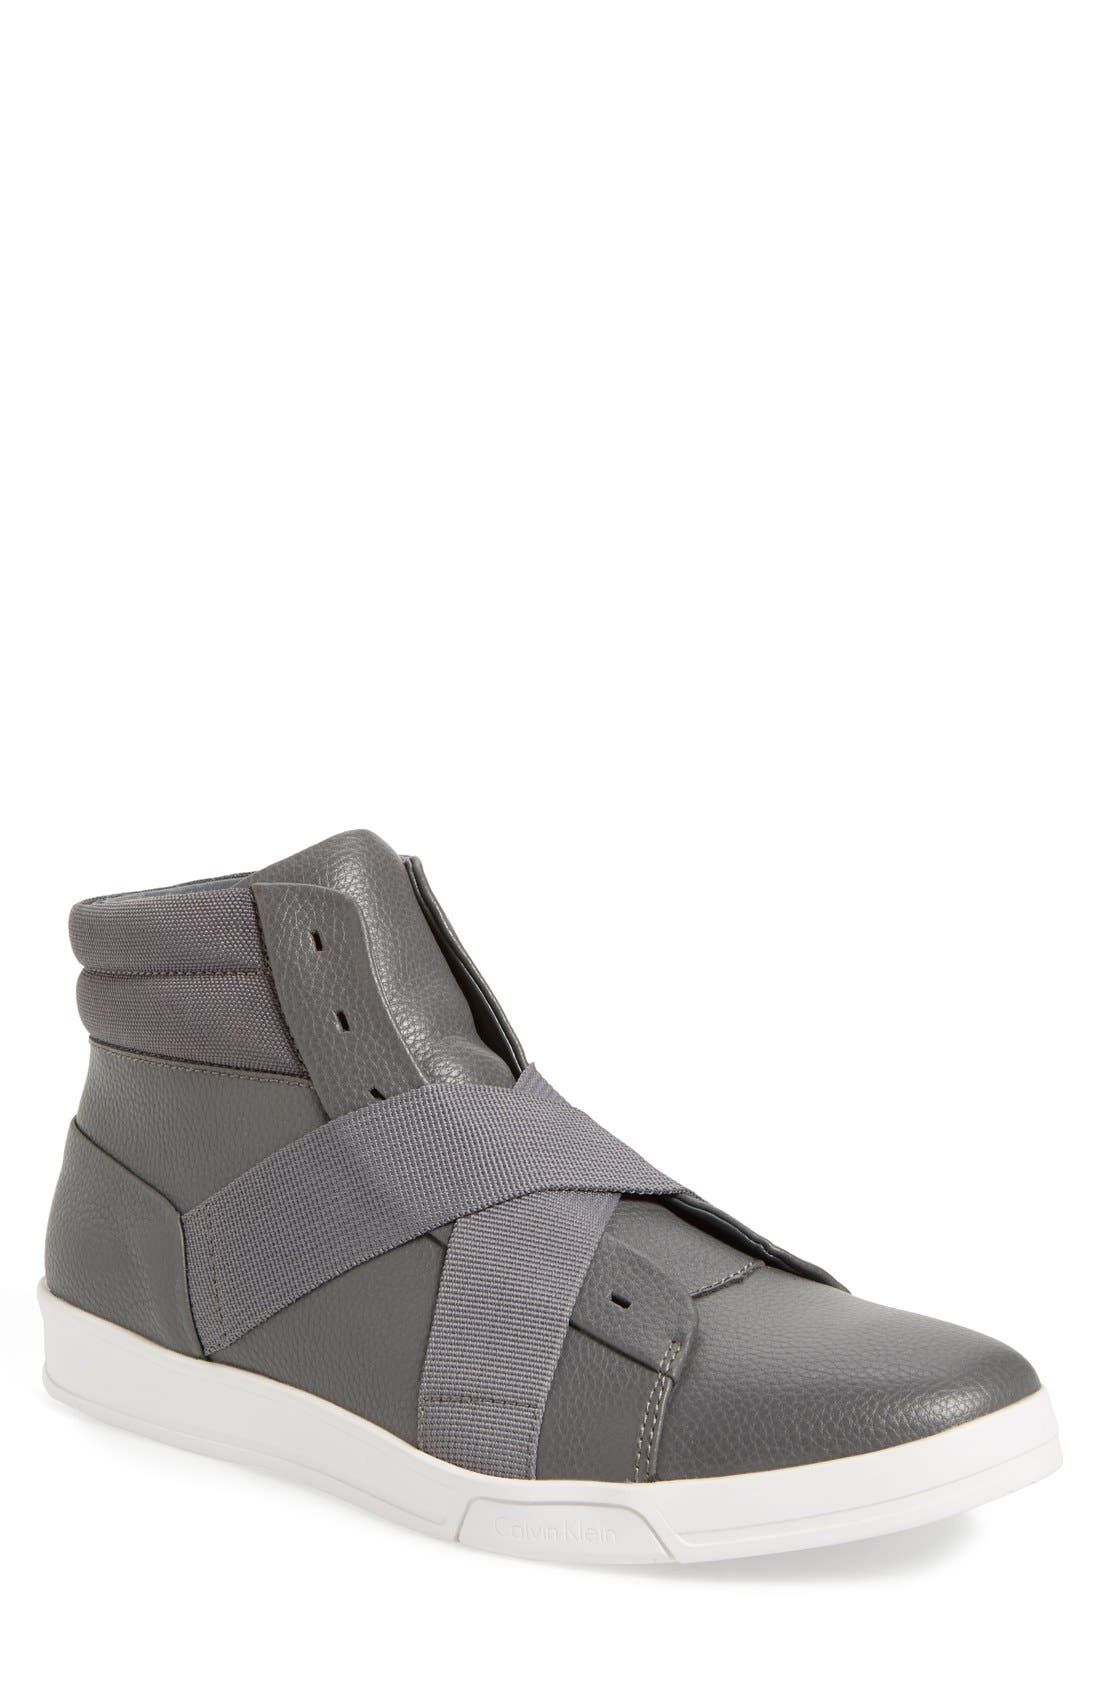 Alternate Image 1 Selected - Calvin Klein 'Banjo' High Top Sneaker (Men)